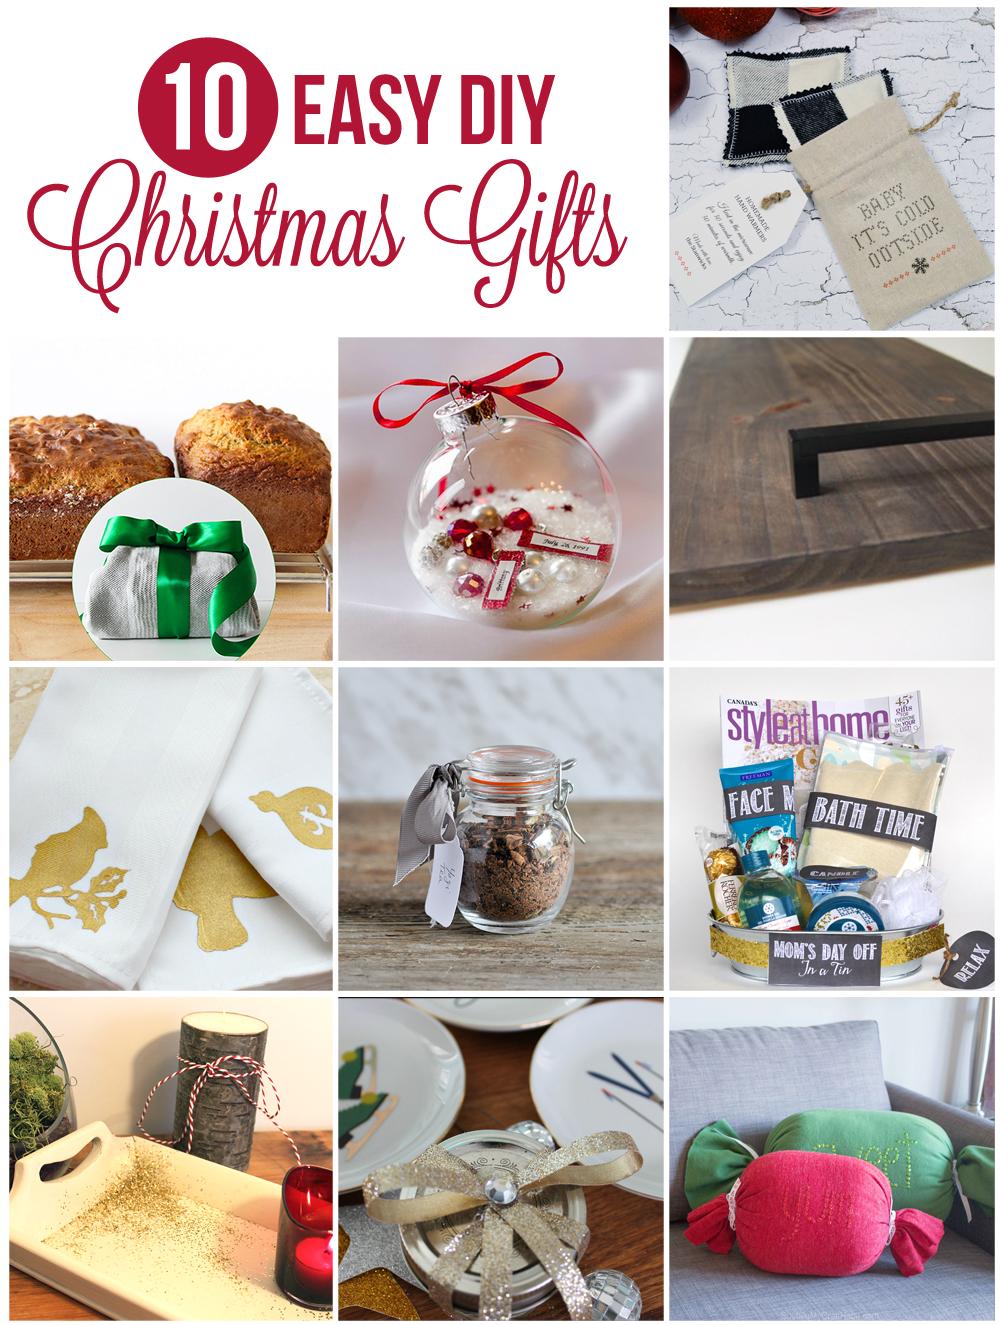 10 Easy DIY Christmas Gift Ideas Blog Hop - SustainMyCraftHabit